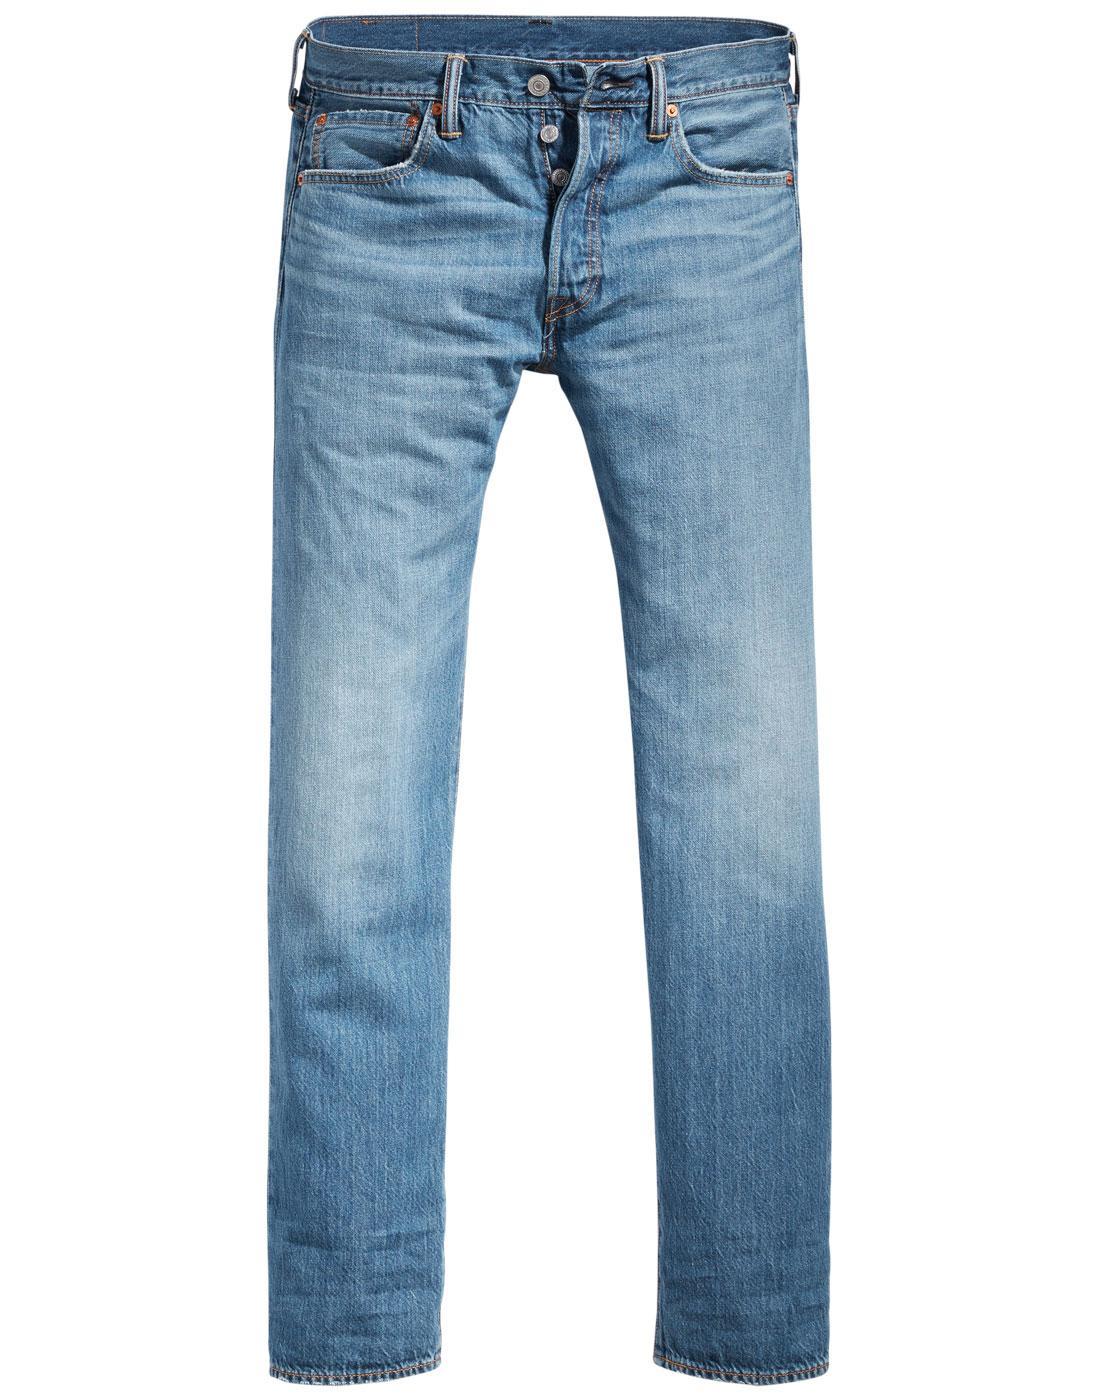 LEVI'S 501 Original Straight Jeans ROCKY ROAD COOL